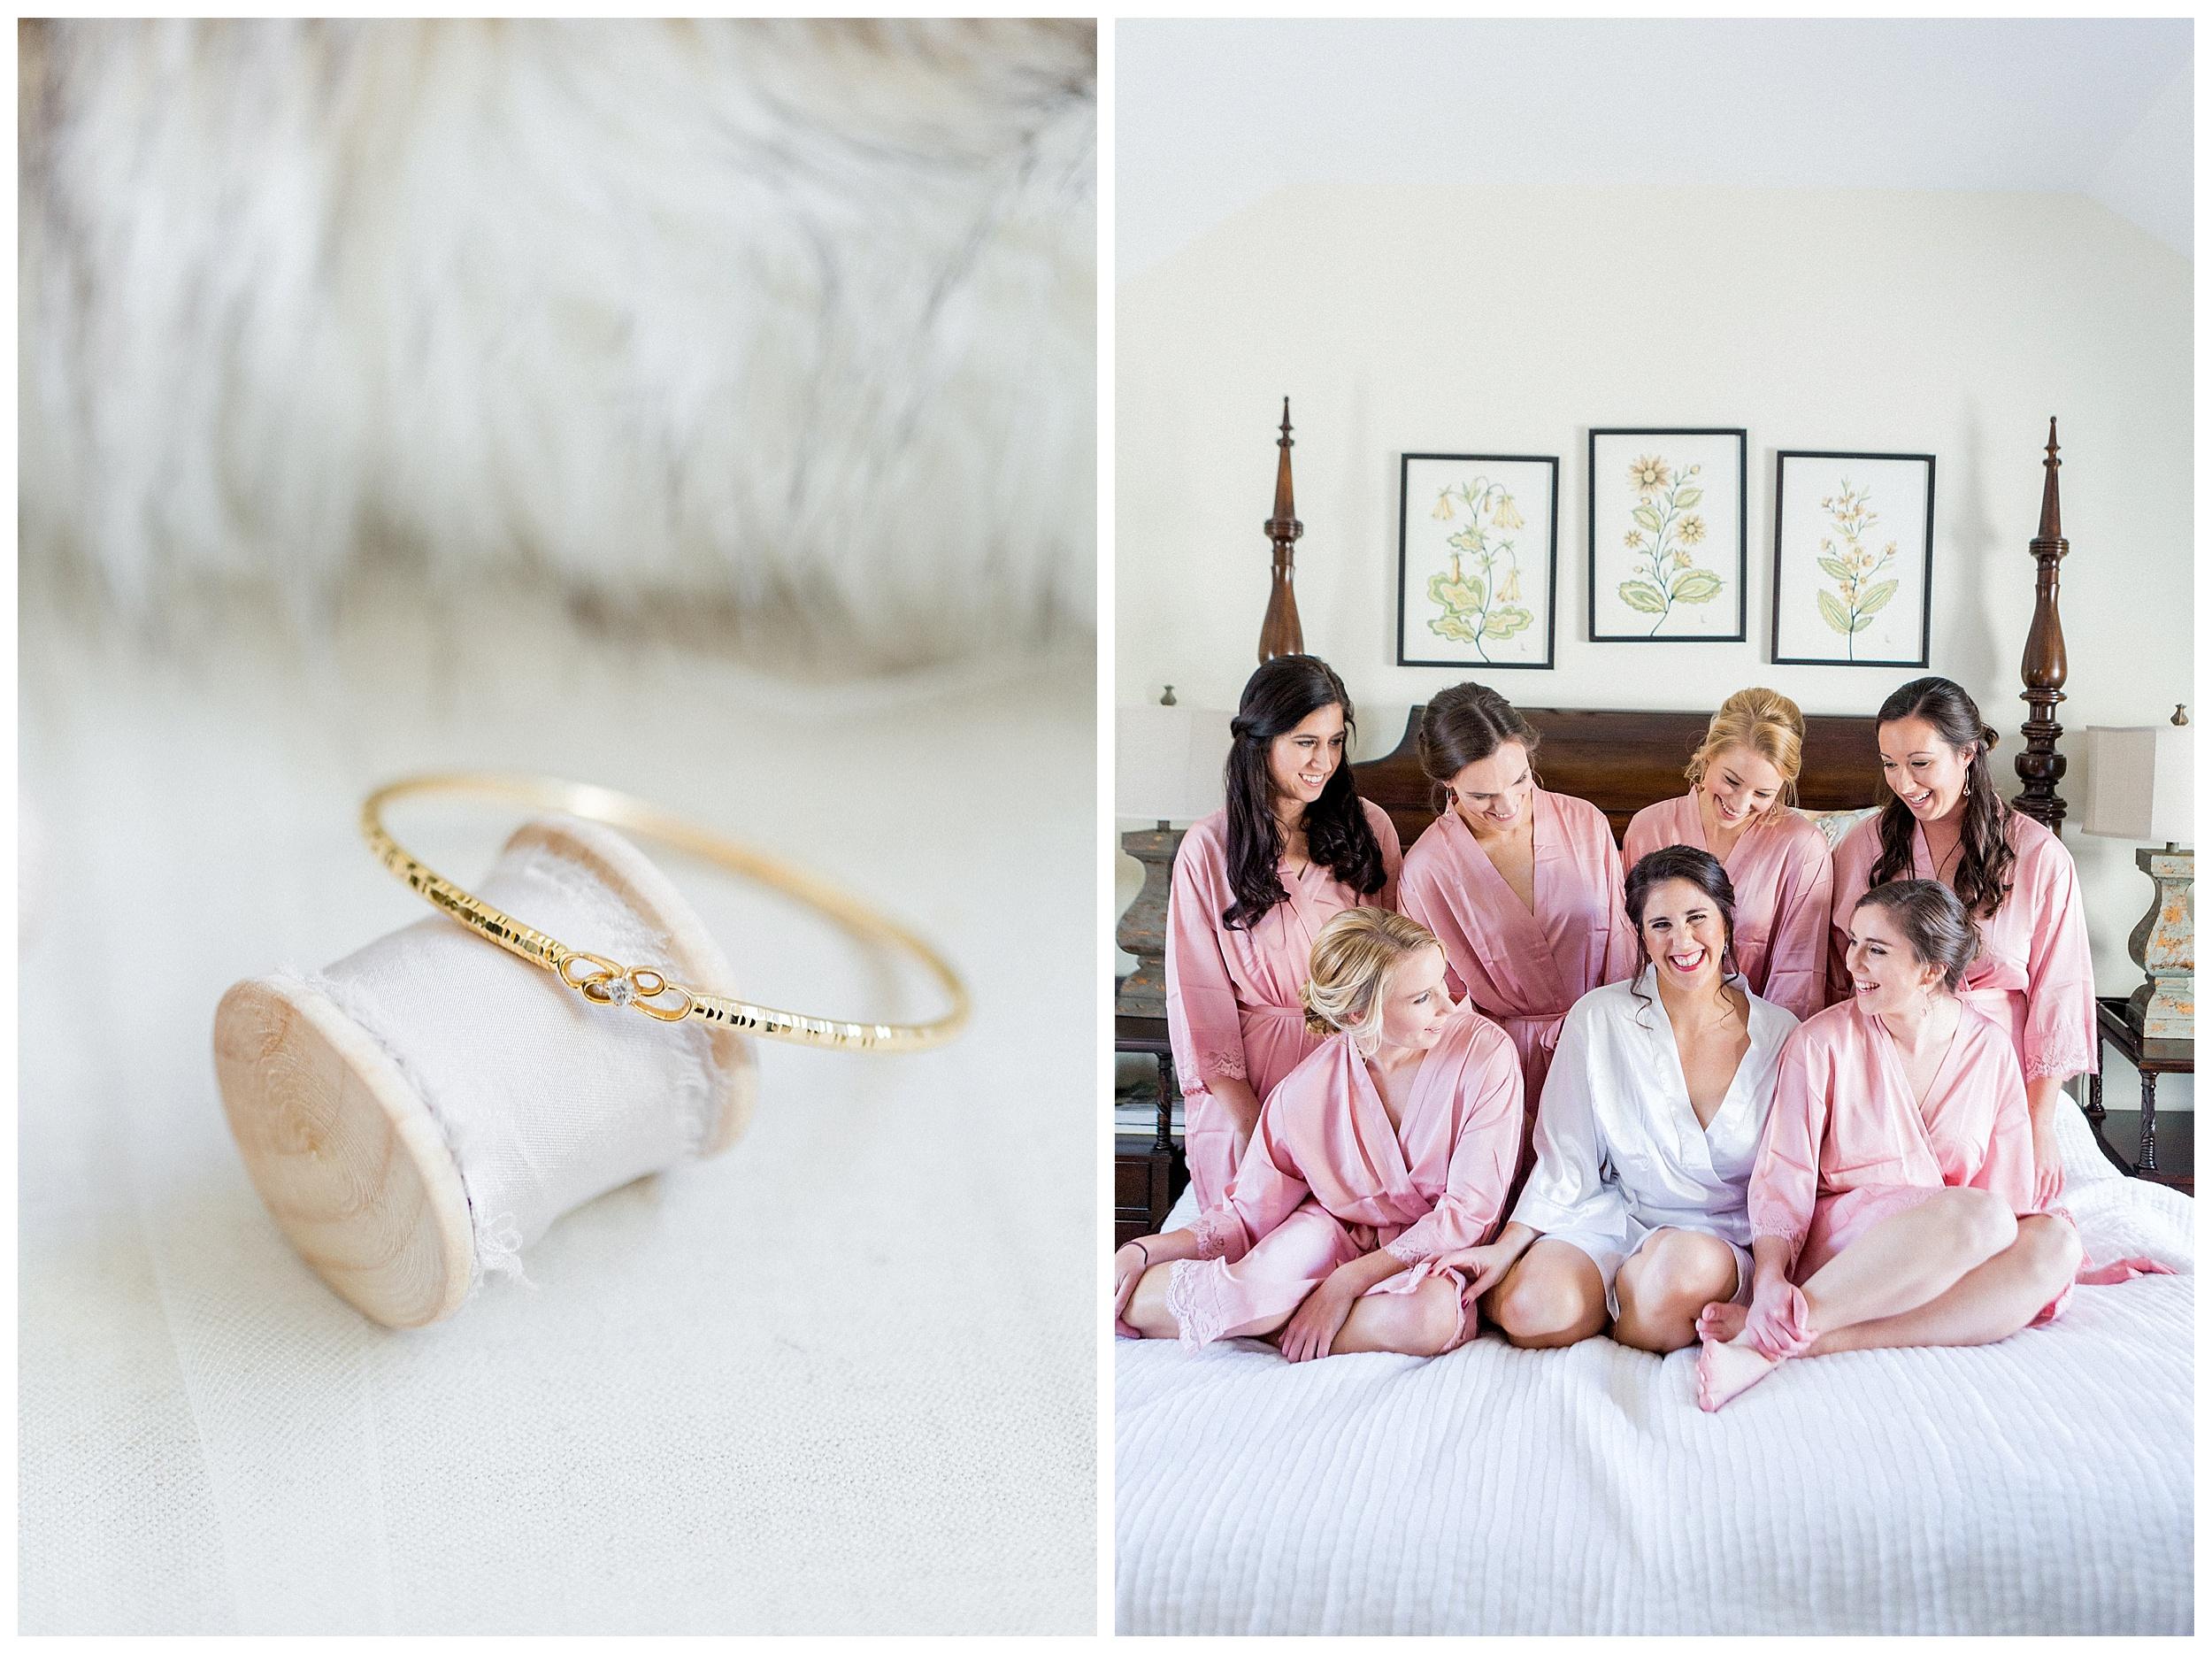 Stone Tower Winery Wedding | Virginia Winter Wedding | VA Wedding Photographer Kir Tuben_0002.jpg